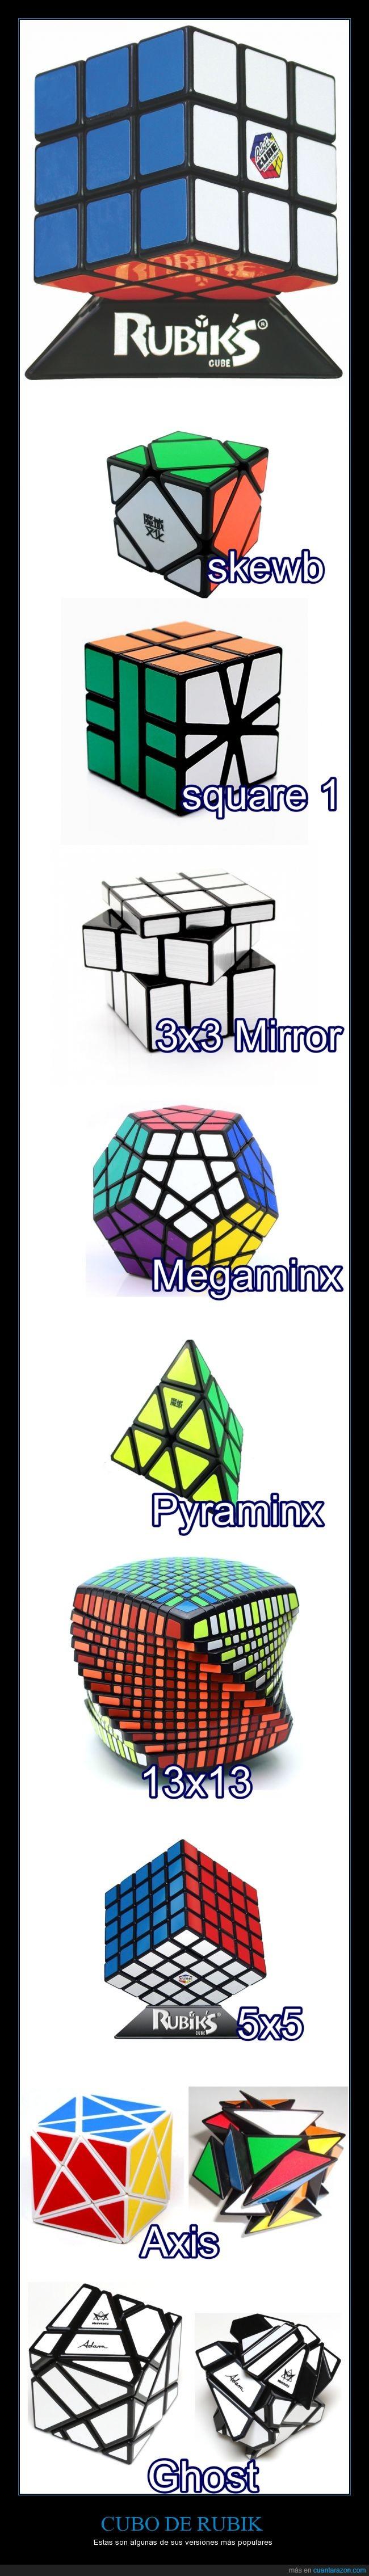 axis,cubo,ghost,megaminx,pyraminx,rubik,sq1